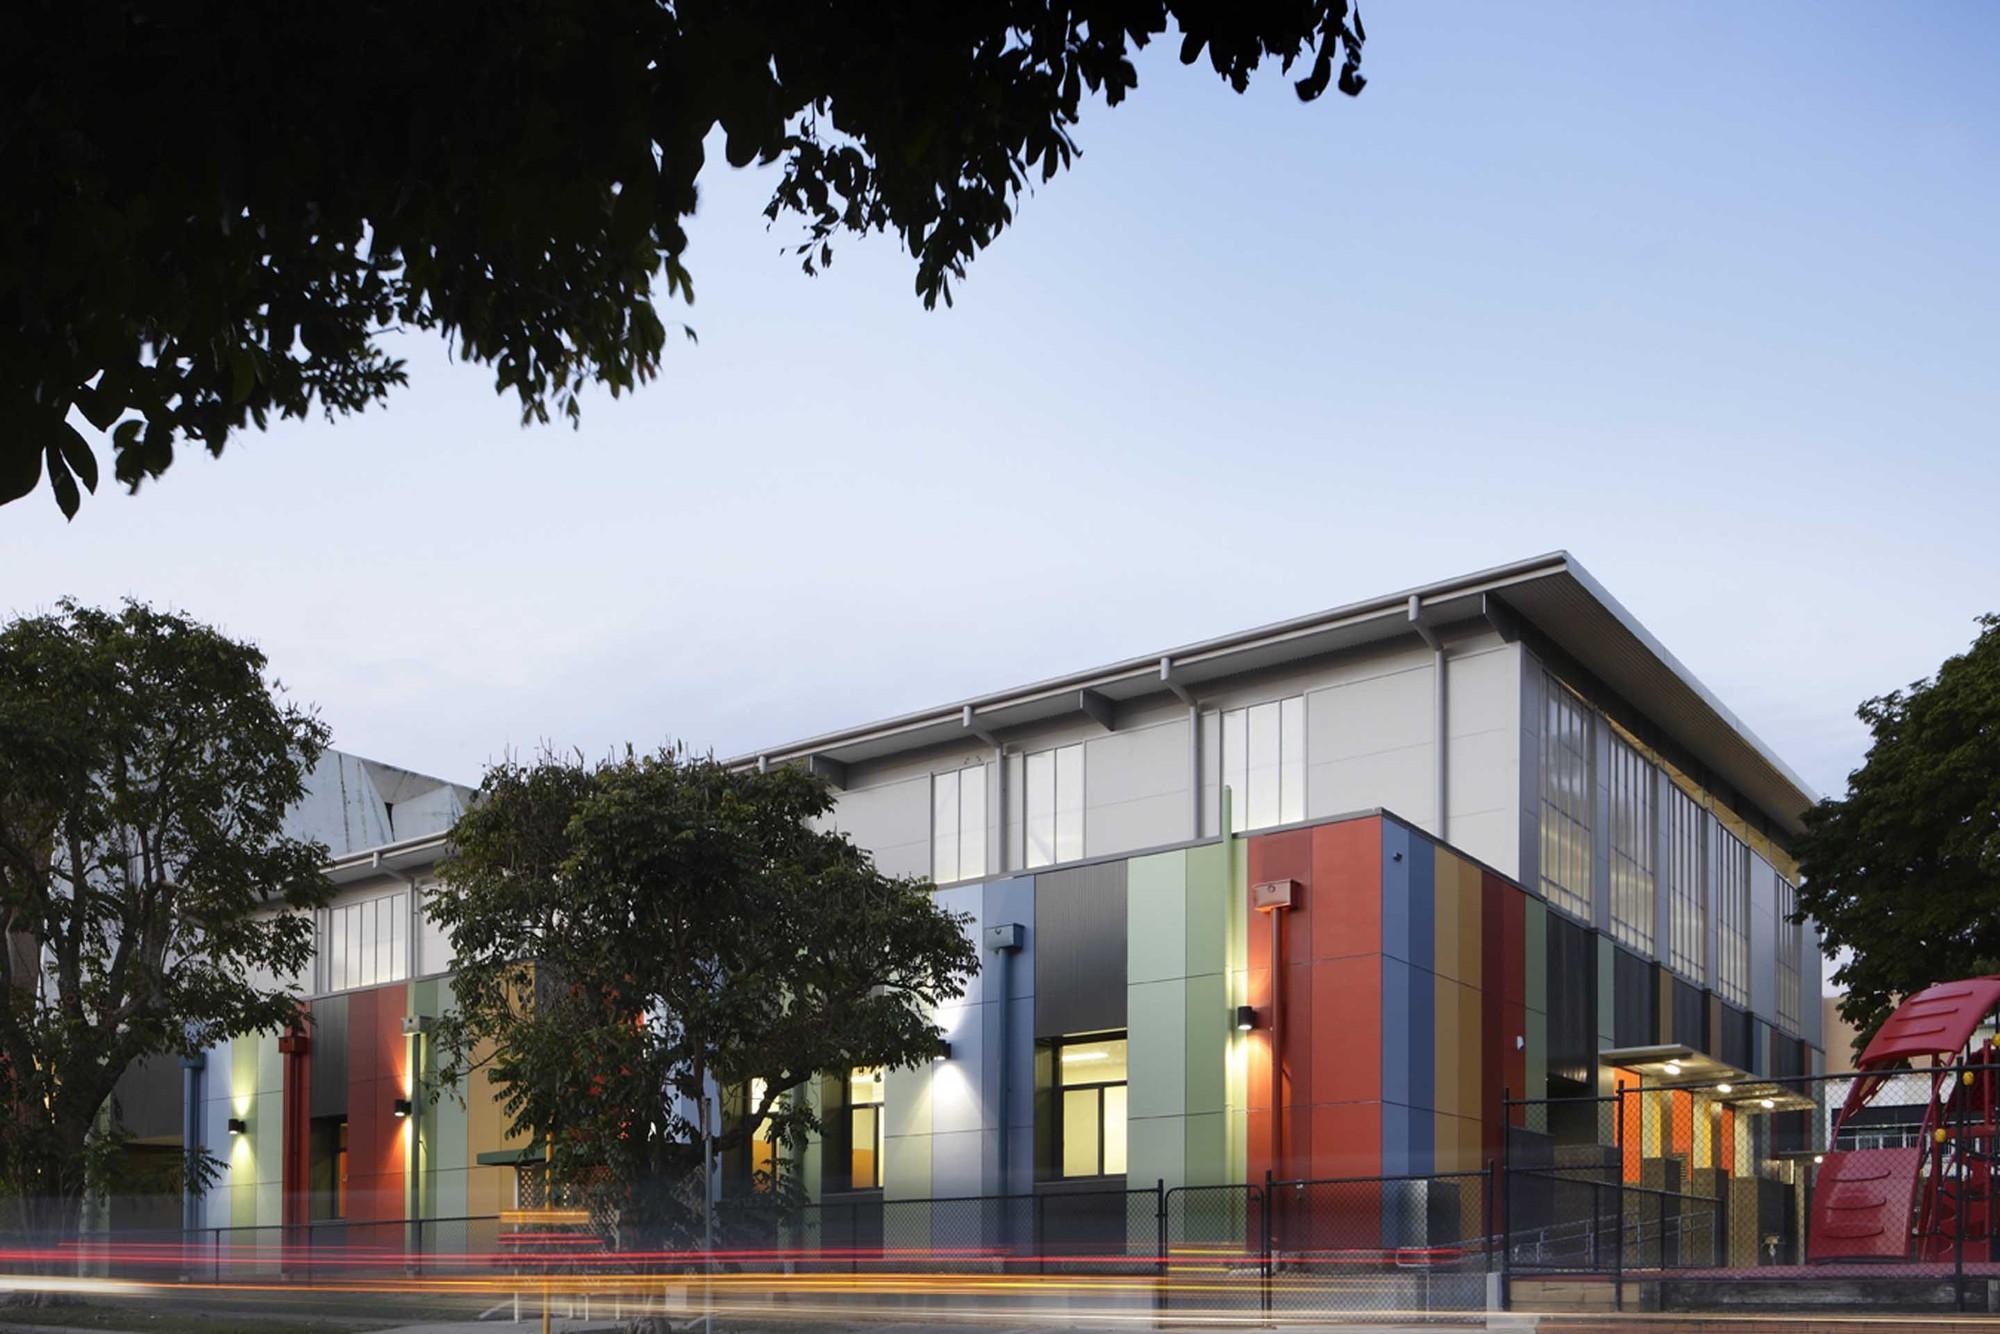 Holy Family School / Ferrier Baudet Architects, © David Sandison